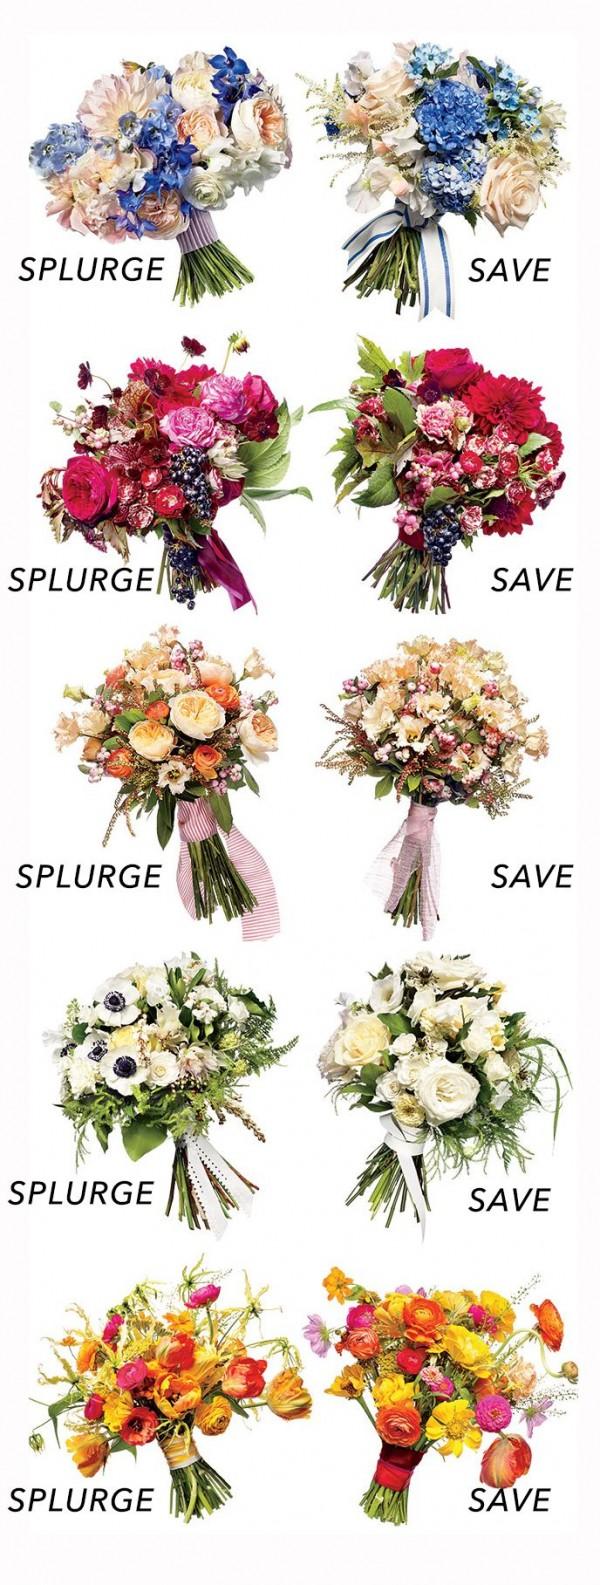 Cheap Flower Alternatives Save Vs Splurge - DIY Weddings